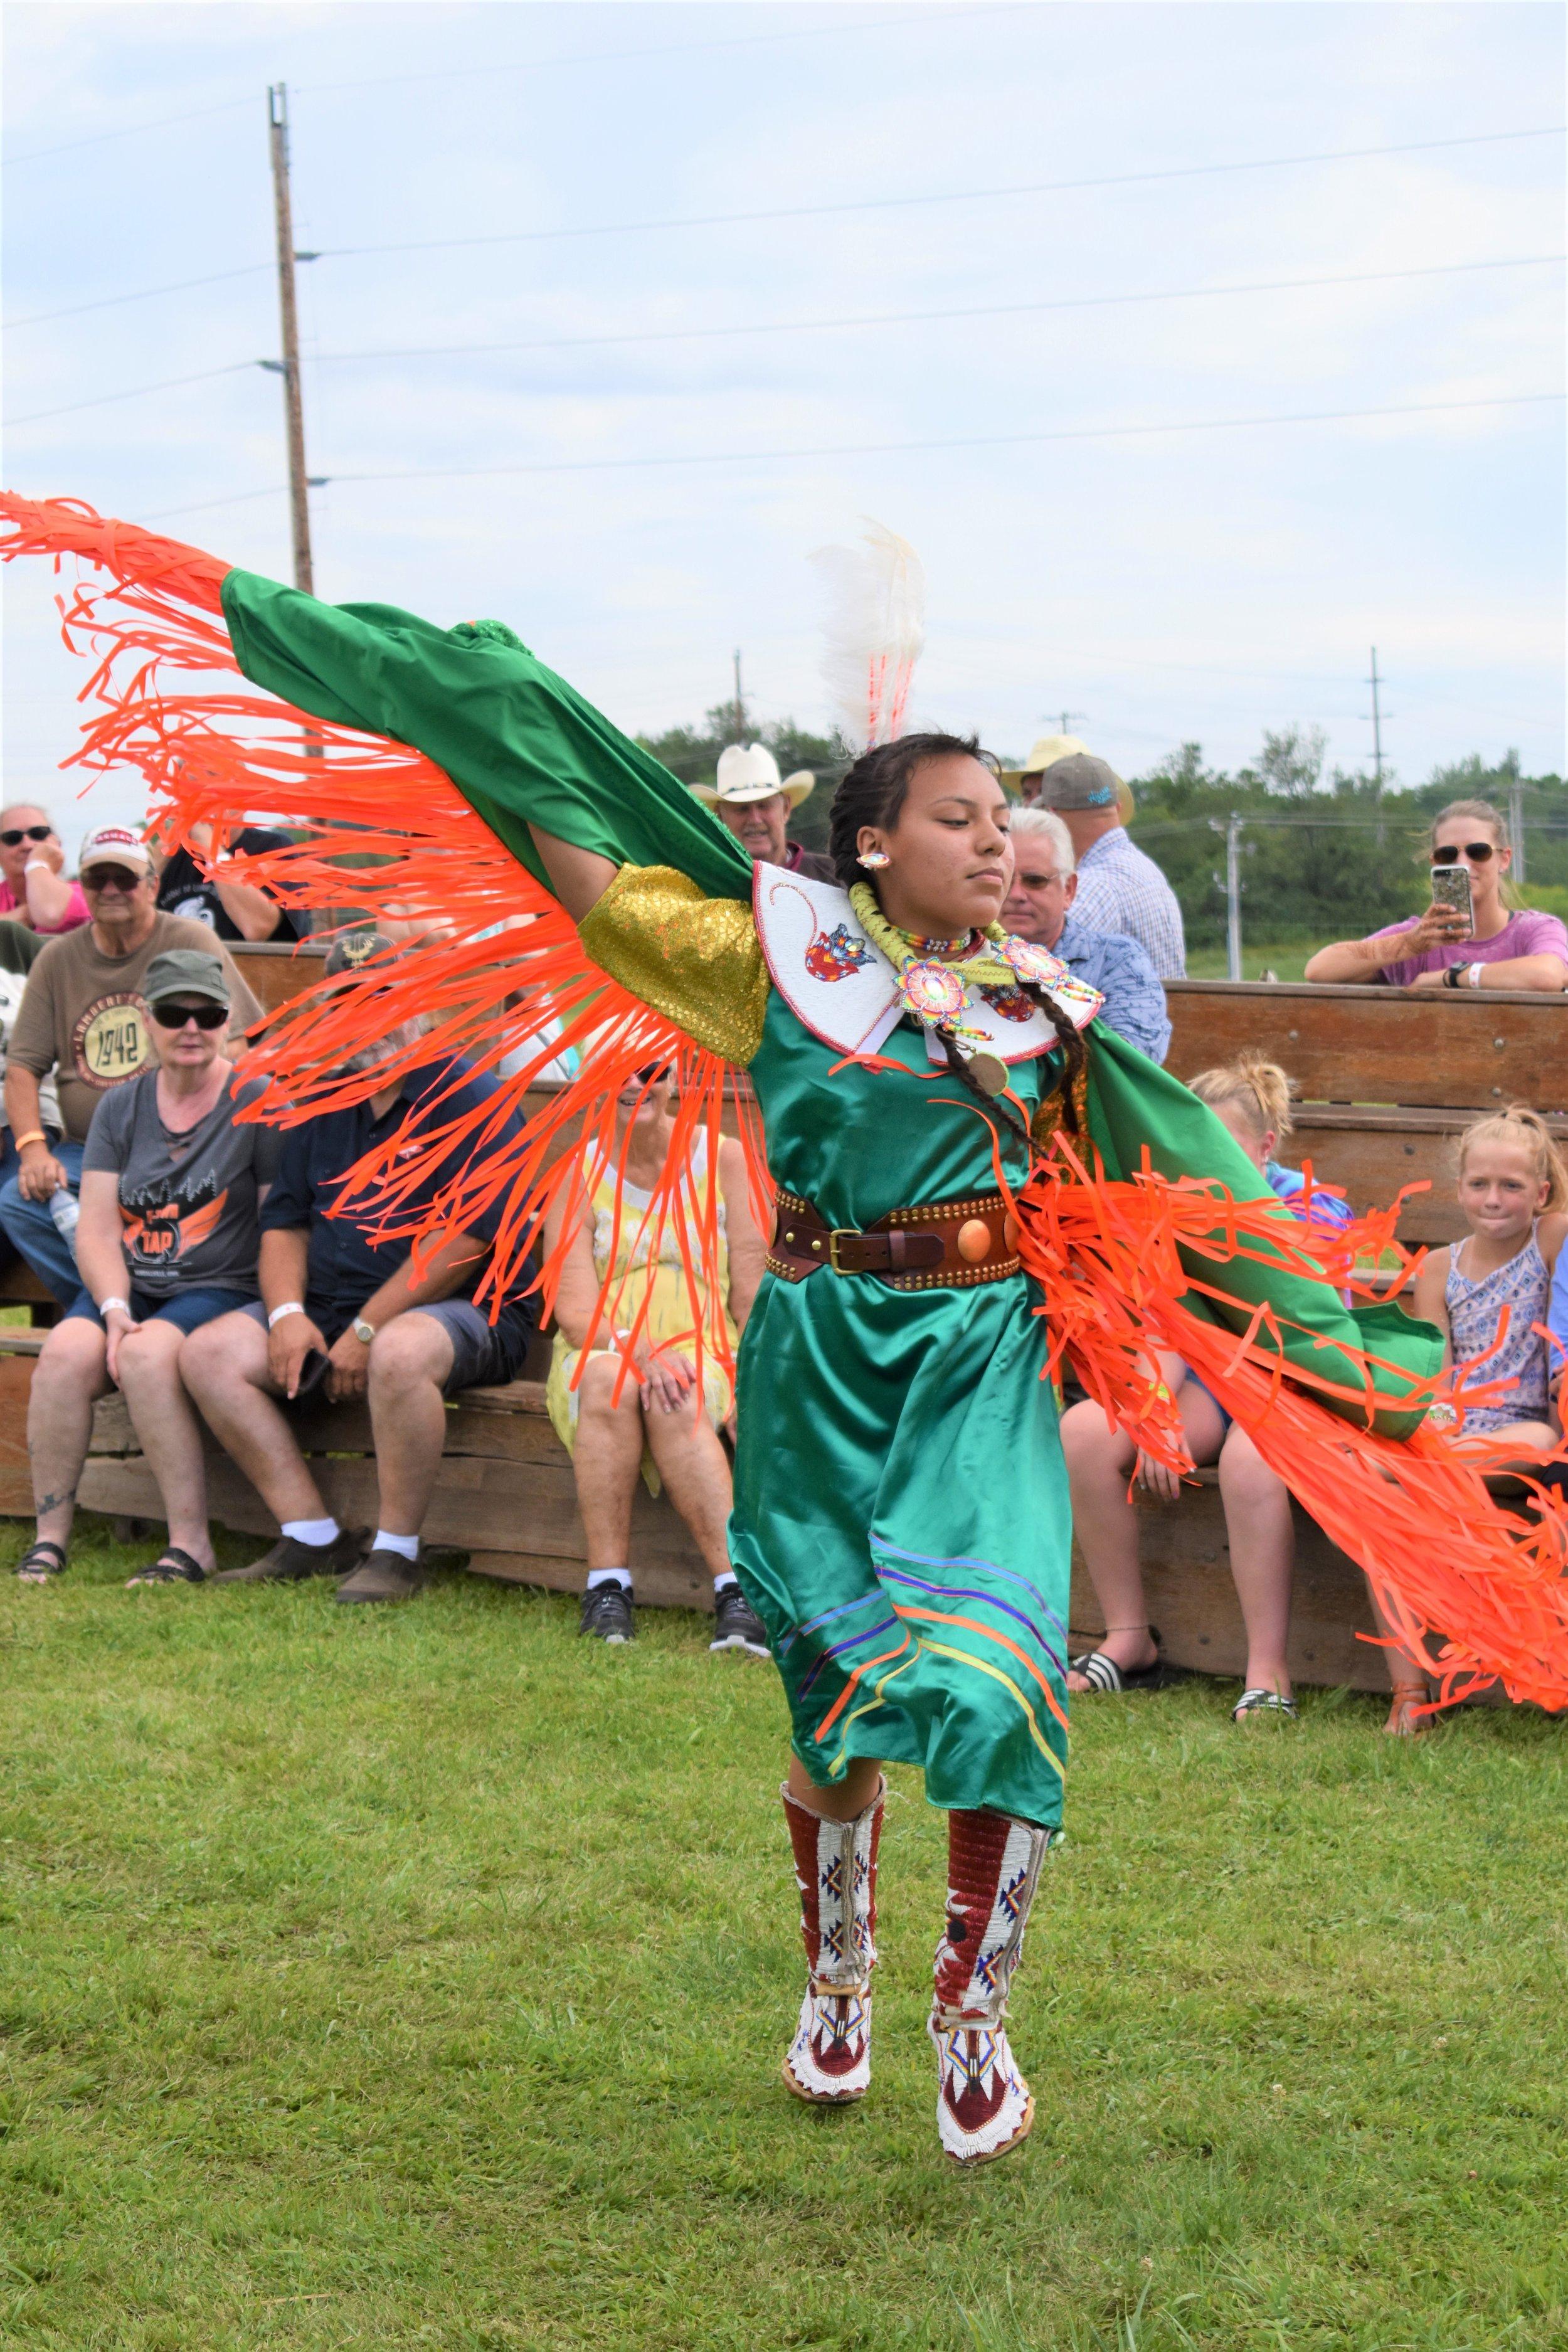 Fancy Shawl Dancer and Neeshla Powwow Princess Destiny White Cloud